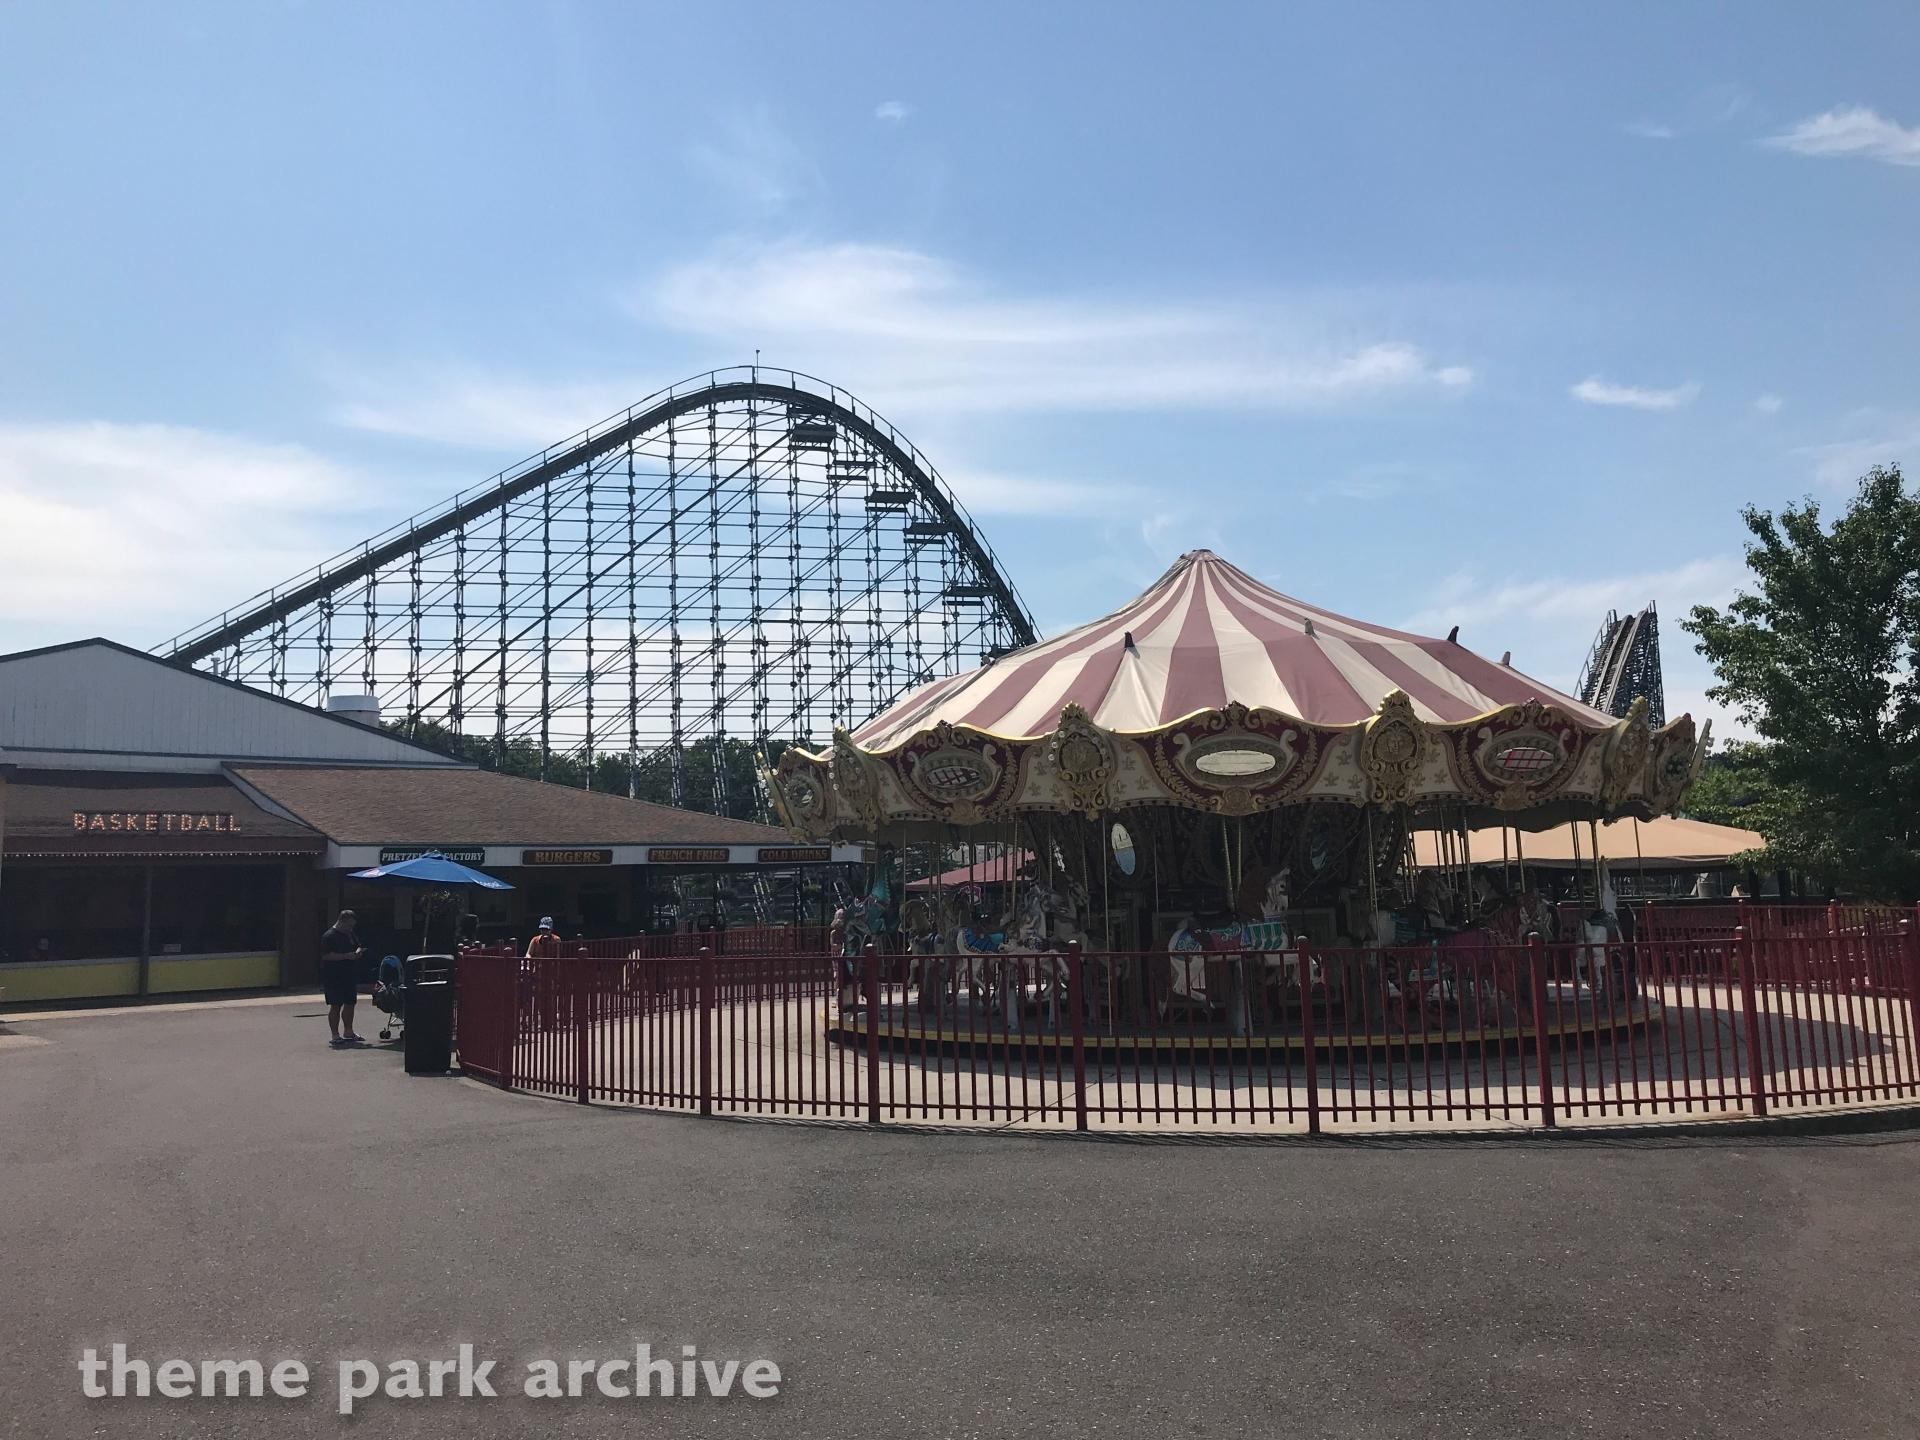 Carousel at Clementon Park & Splash World